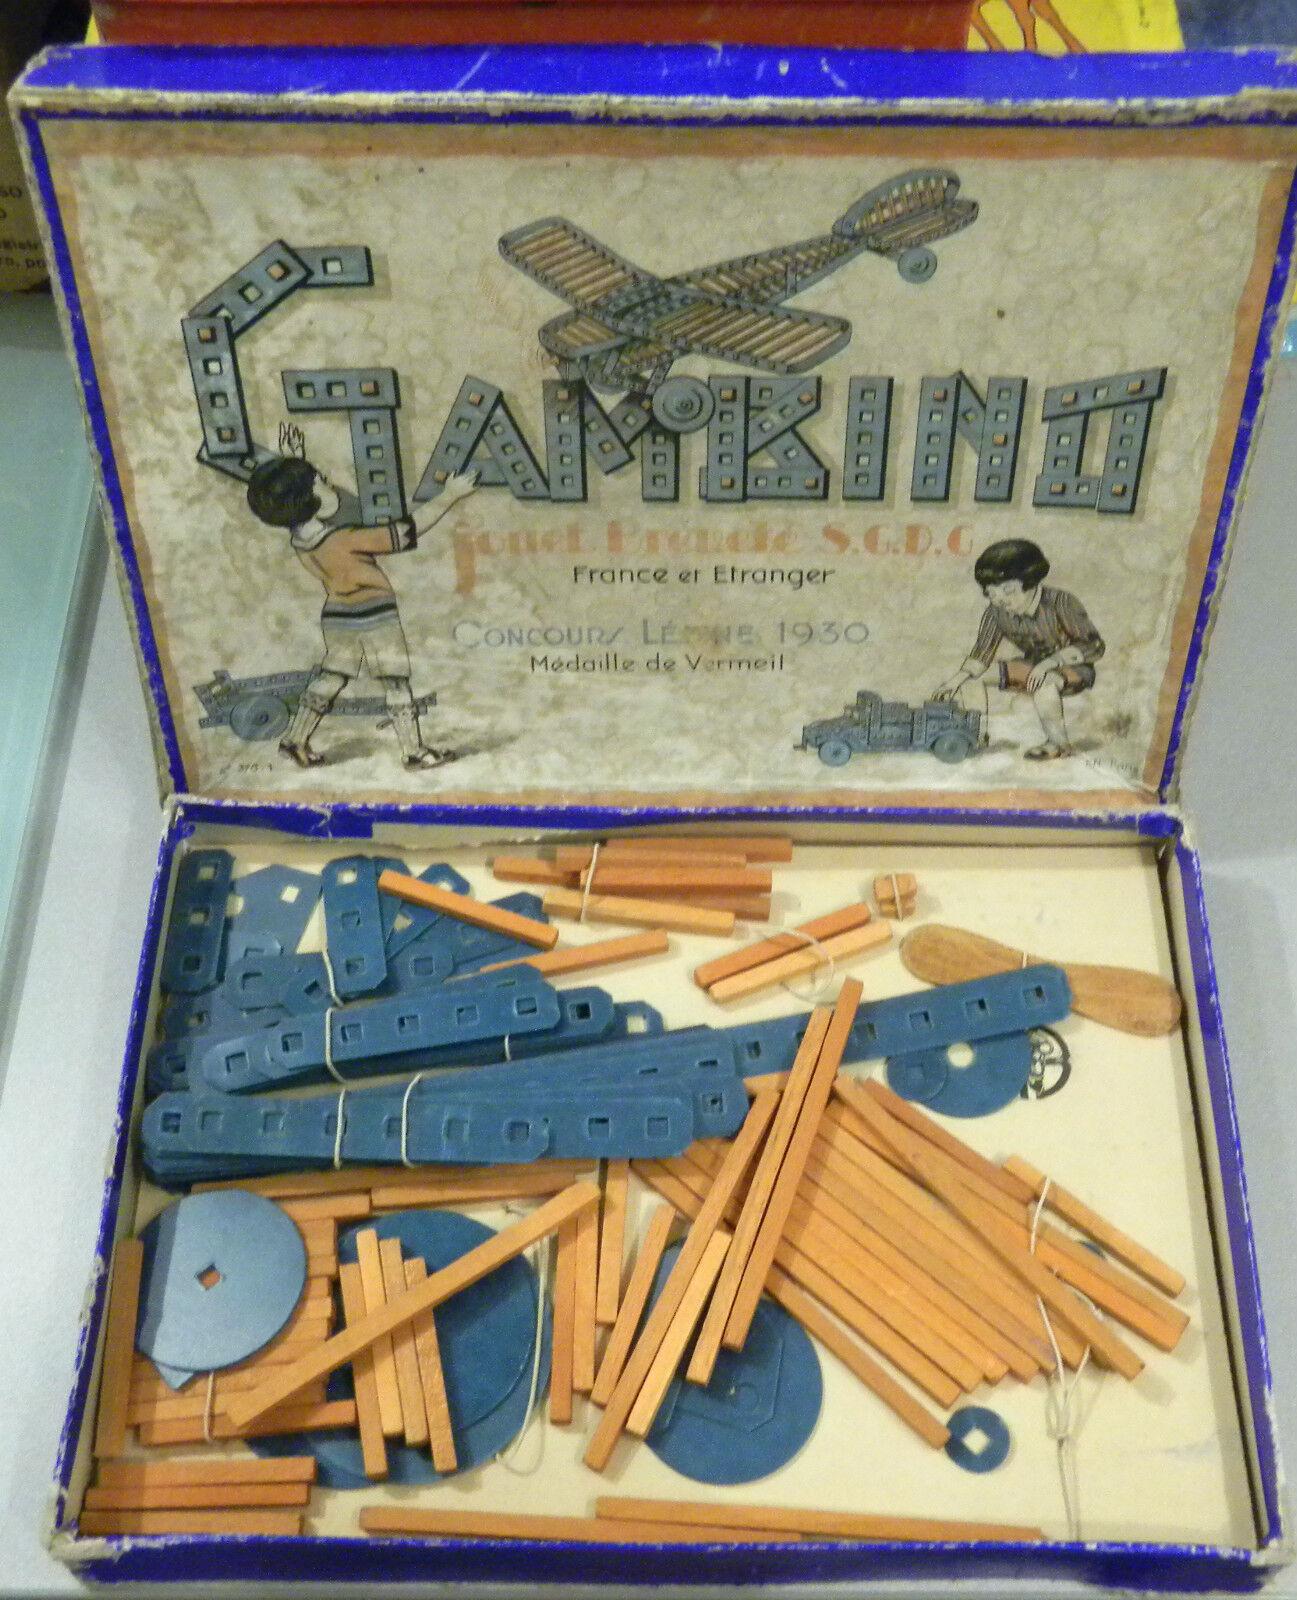 (PRL) GAMBINO JOUET S.G.D.G. 1930 FRANCE GIOCO leksak årgång ANNI'30 AEREO AVION